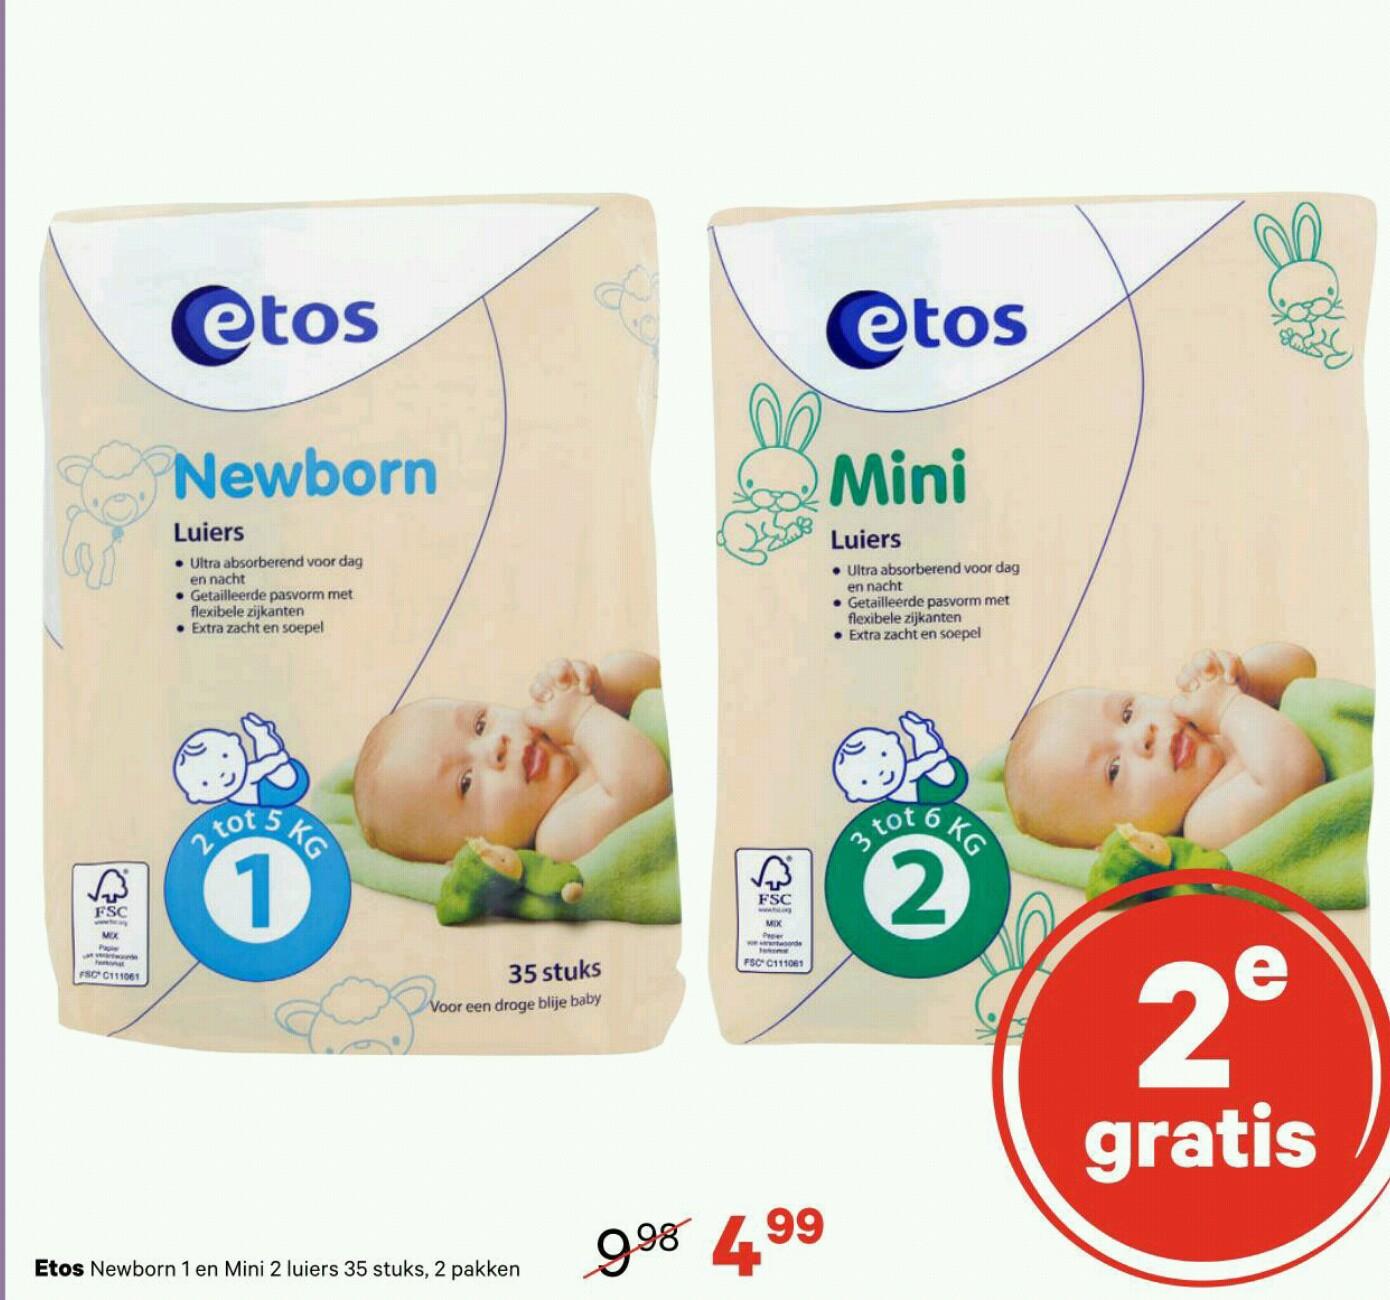 Etos Newborn 1 of Mini 2 luiers de 2e gratis @ Etos (vanaf maandag)